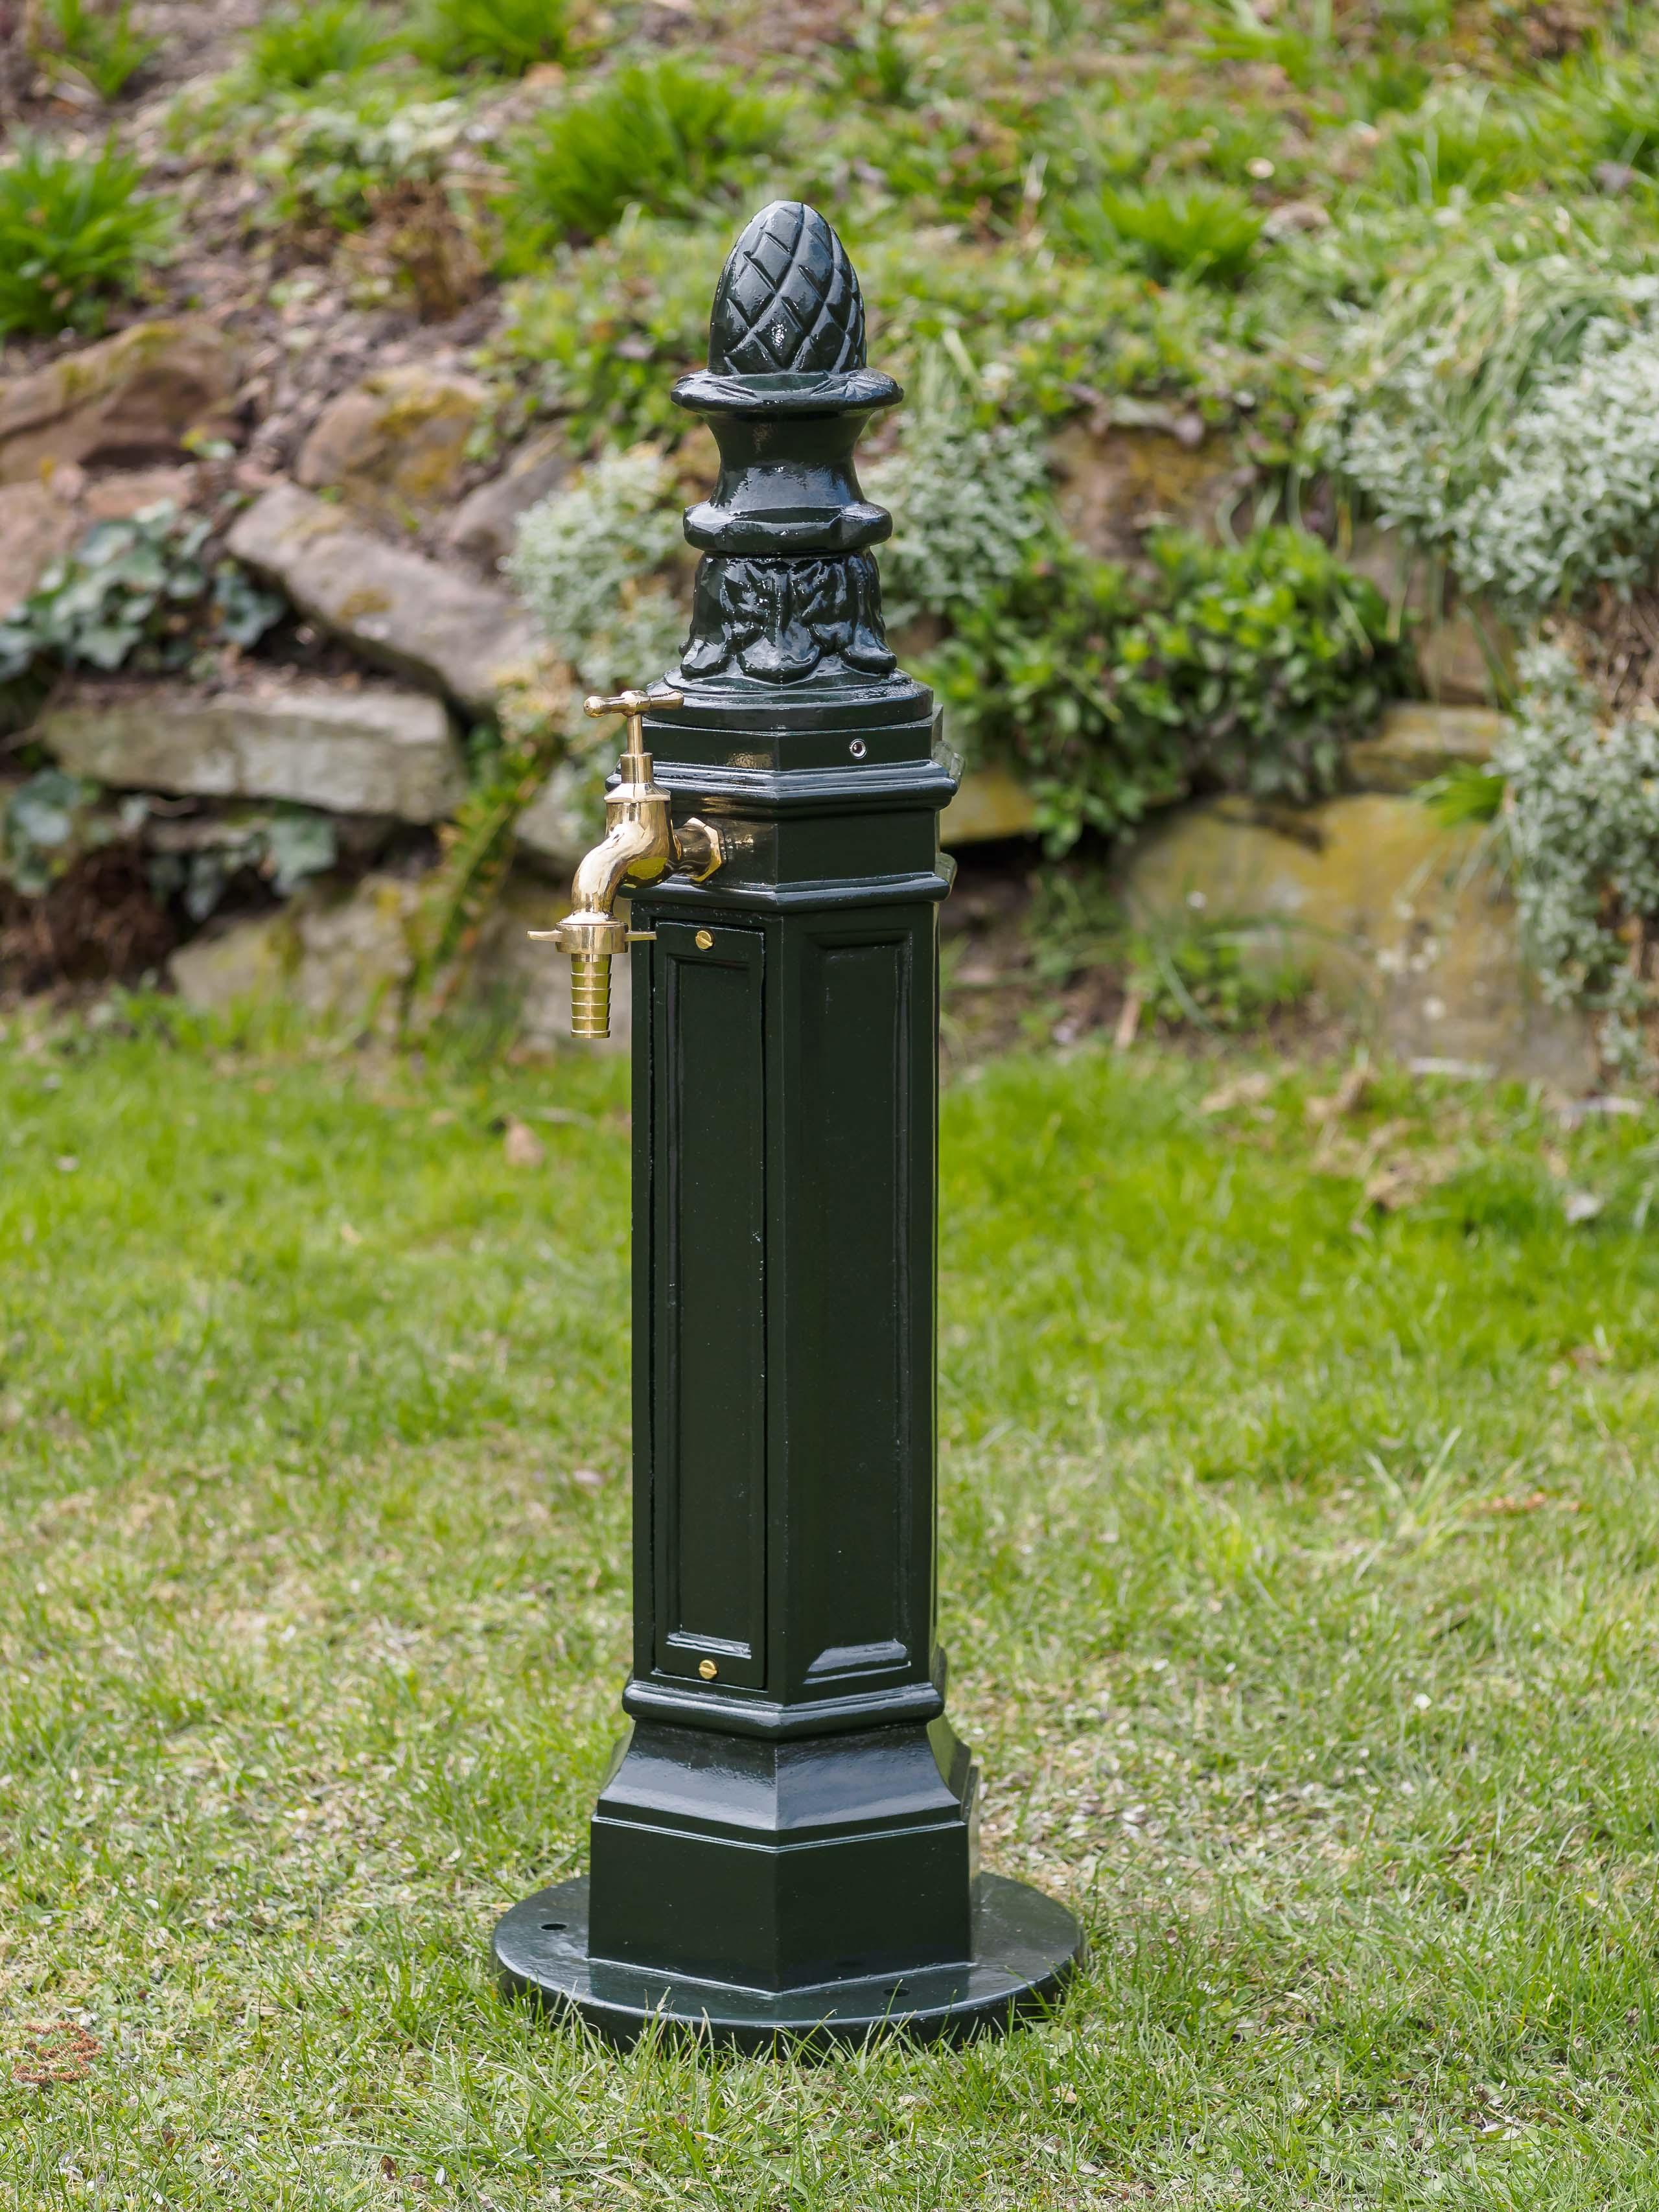 Standbrunnen 95cm Waschbecken Garten Alu Grün Antik Stil Brunnen